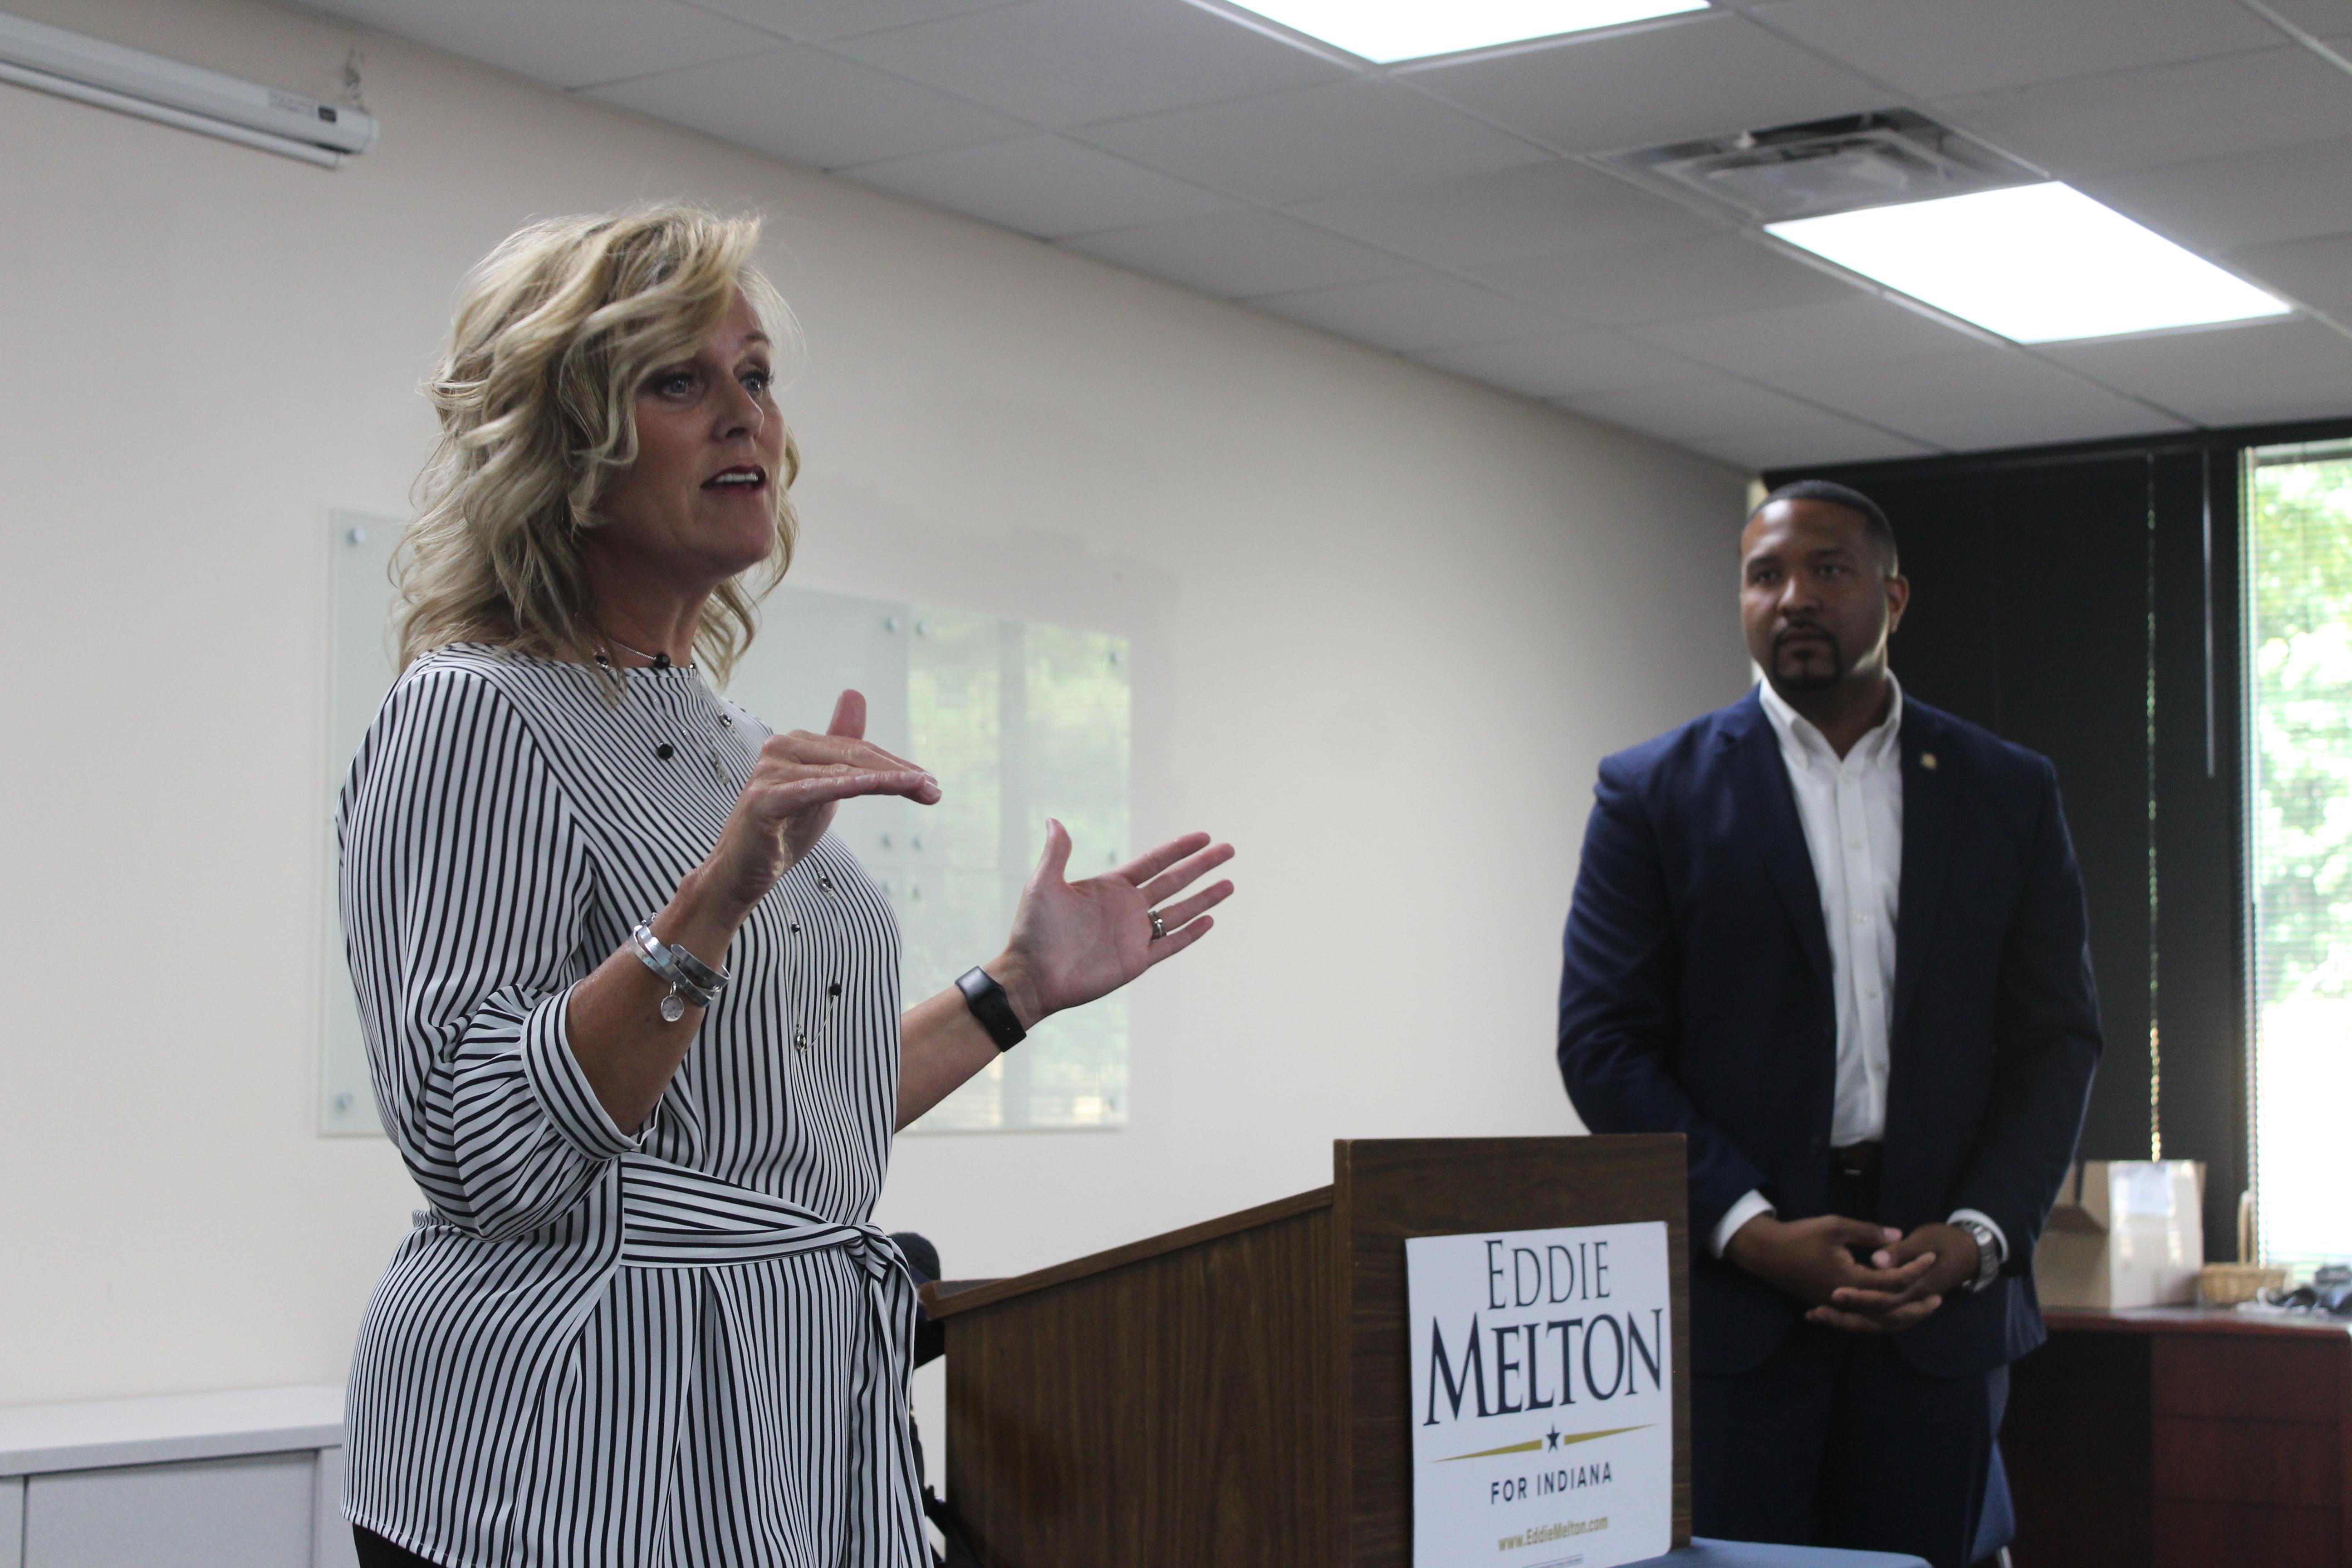 State Superintendent Jennifer McCormick speaks alongside State Senator Eddie Melton in July at their community conversation in Indianapolis.